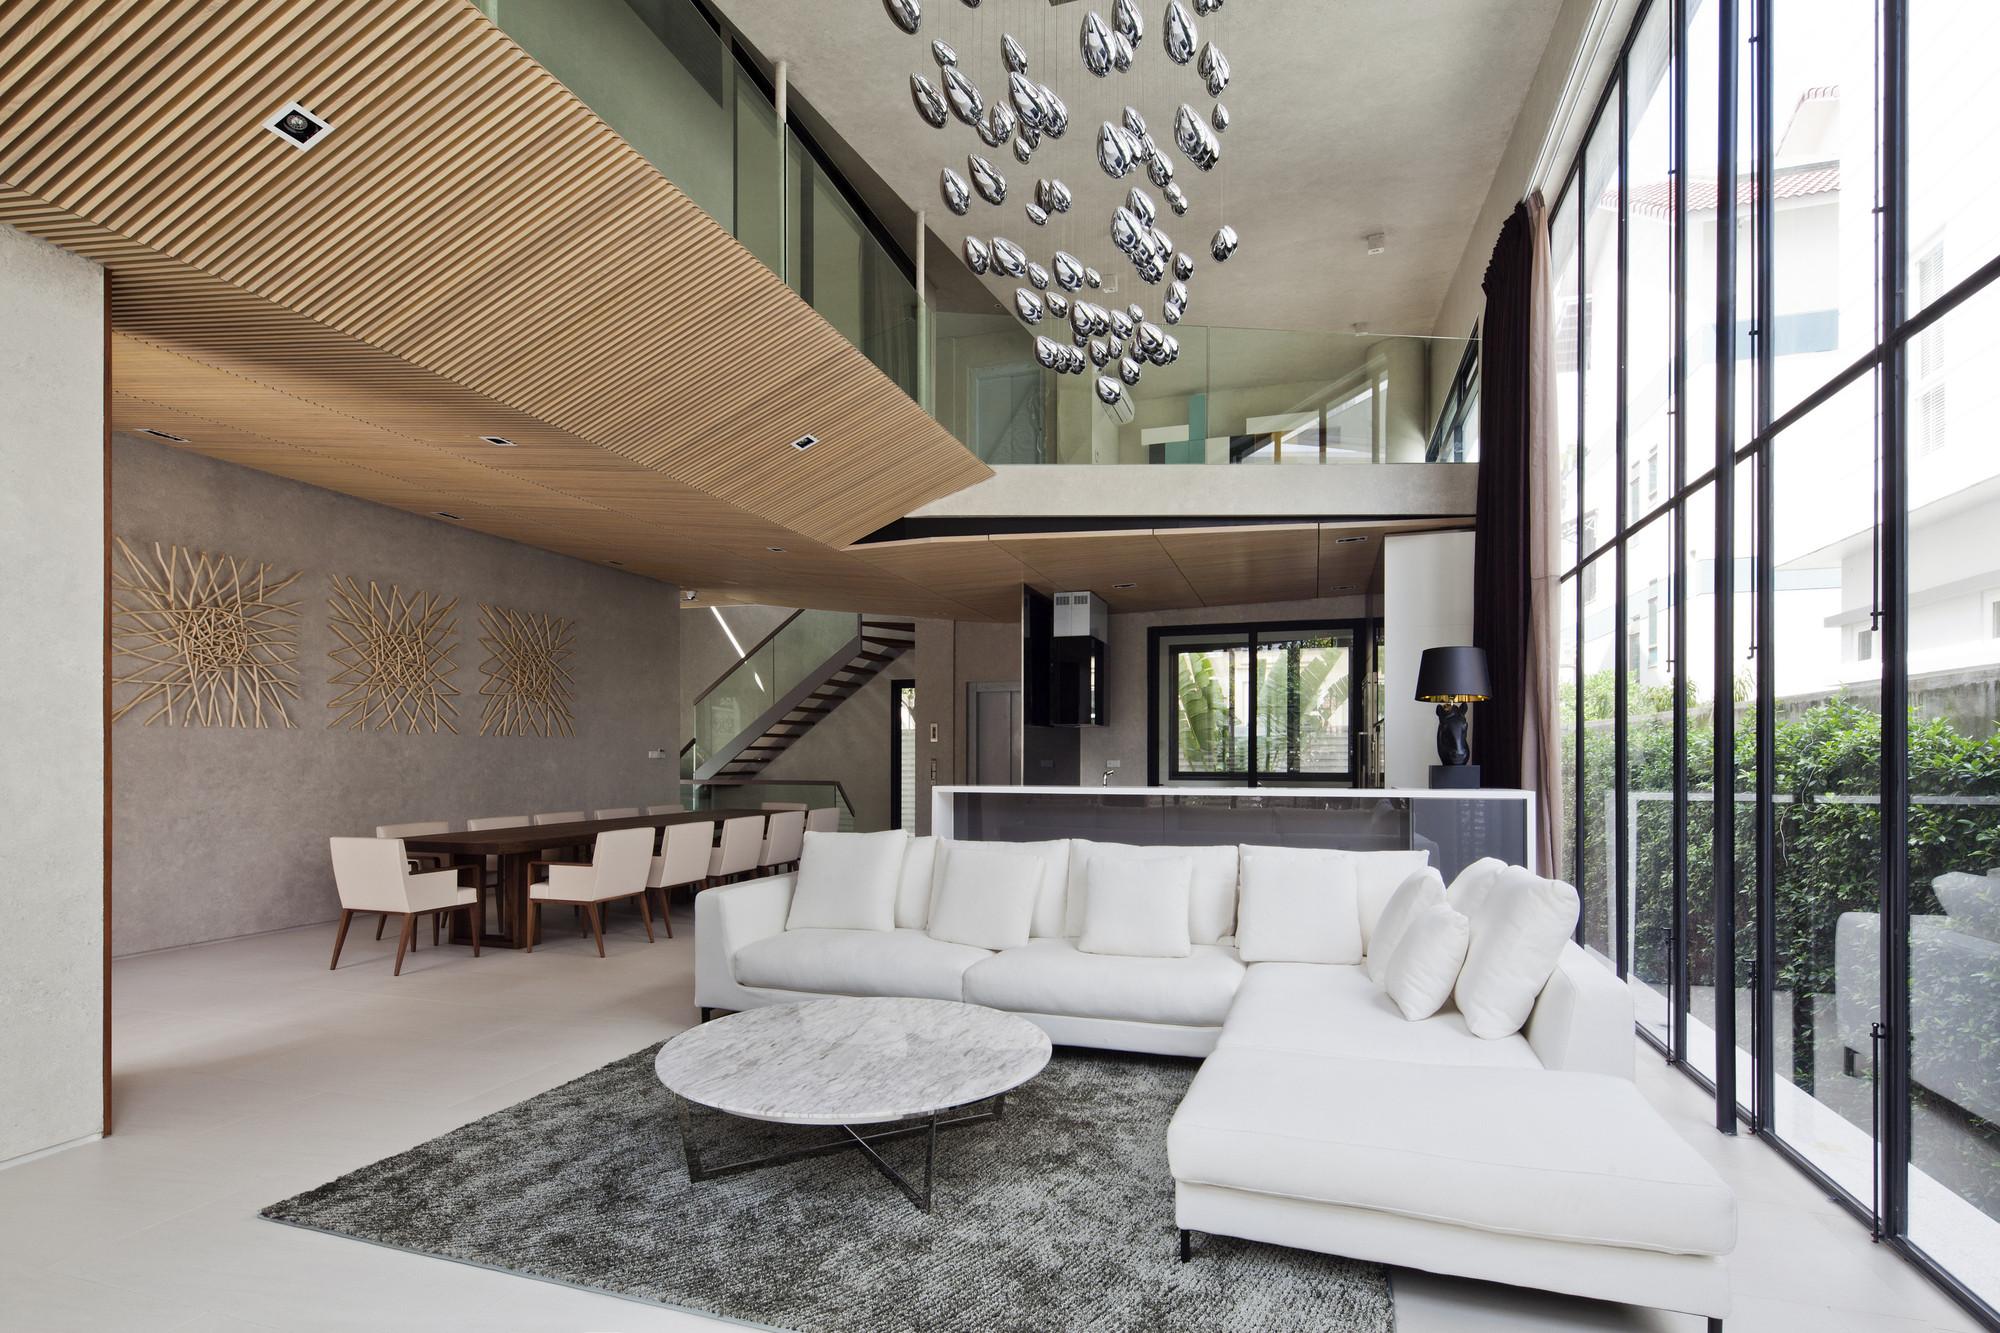 Casa NQ / Nha Dan Architect, © Hiroyuki Oki